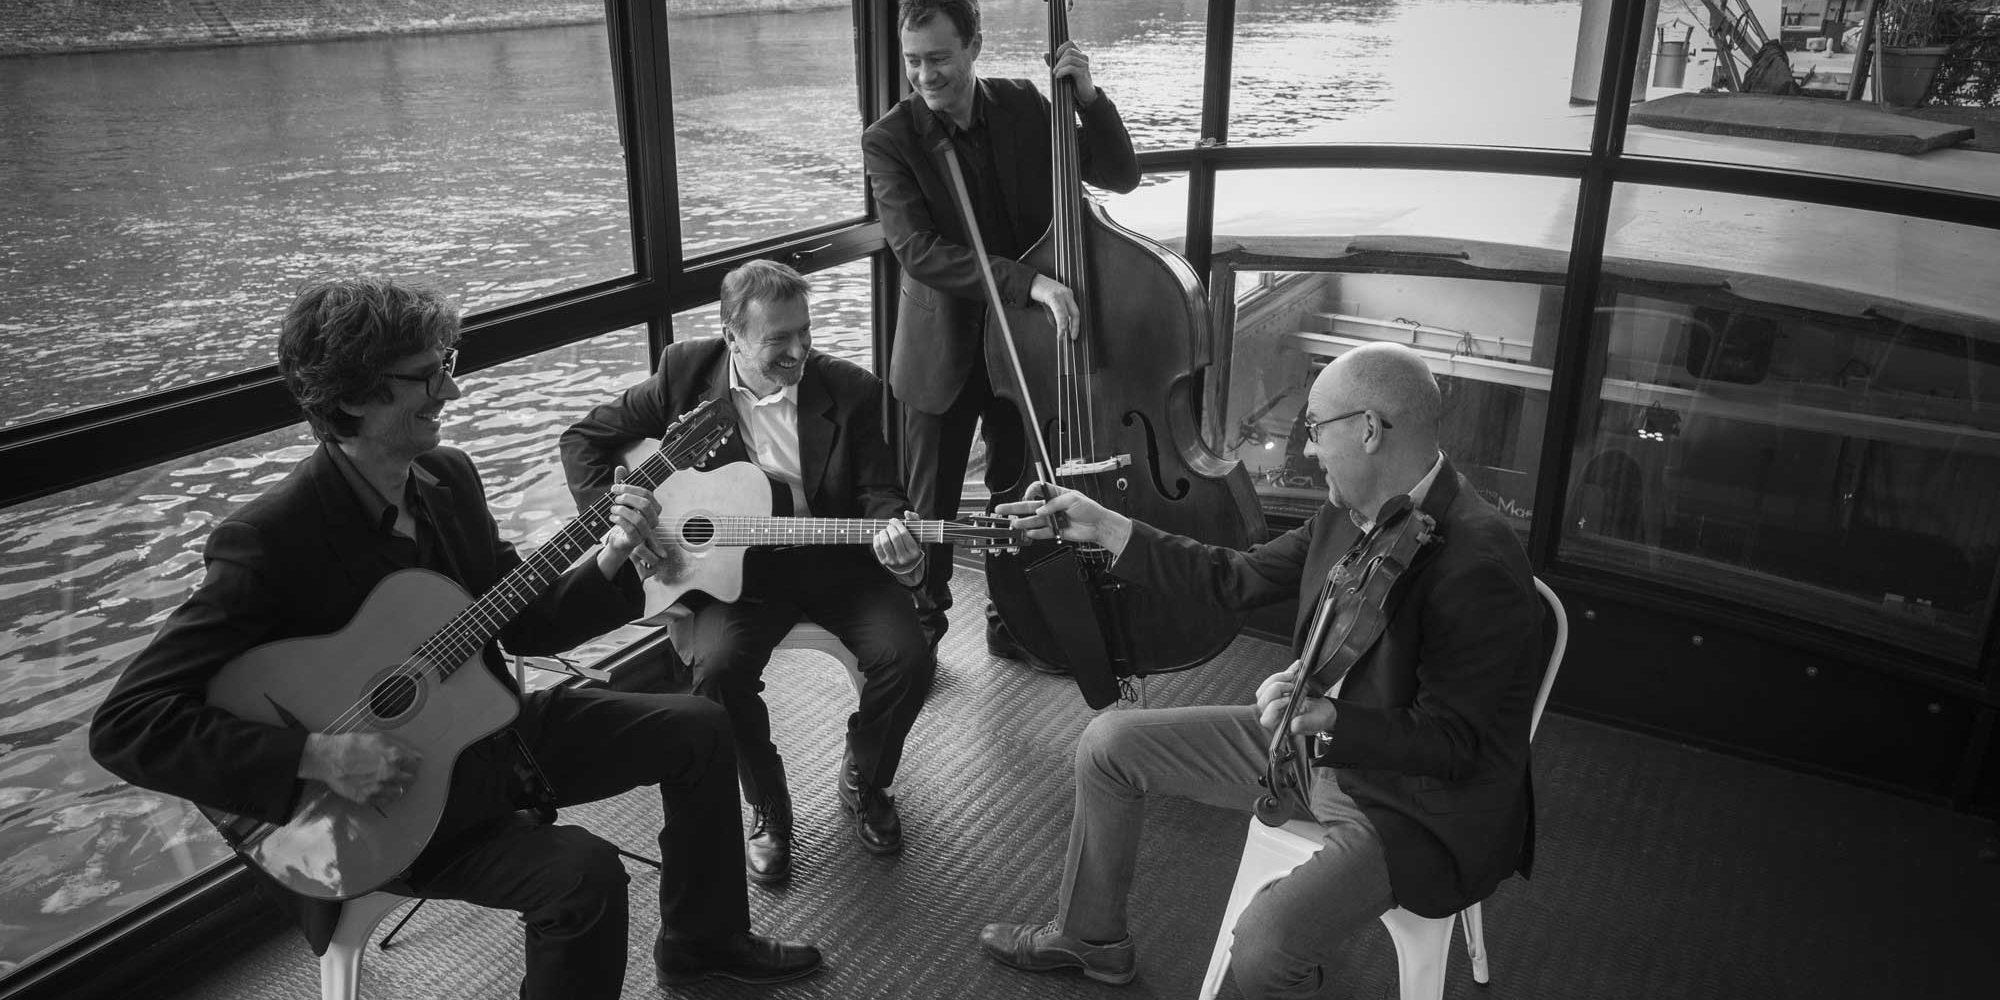 groupe de jazz mariage rhone alpes. Gypsy swing pour cocktail de mariage